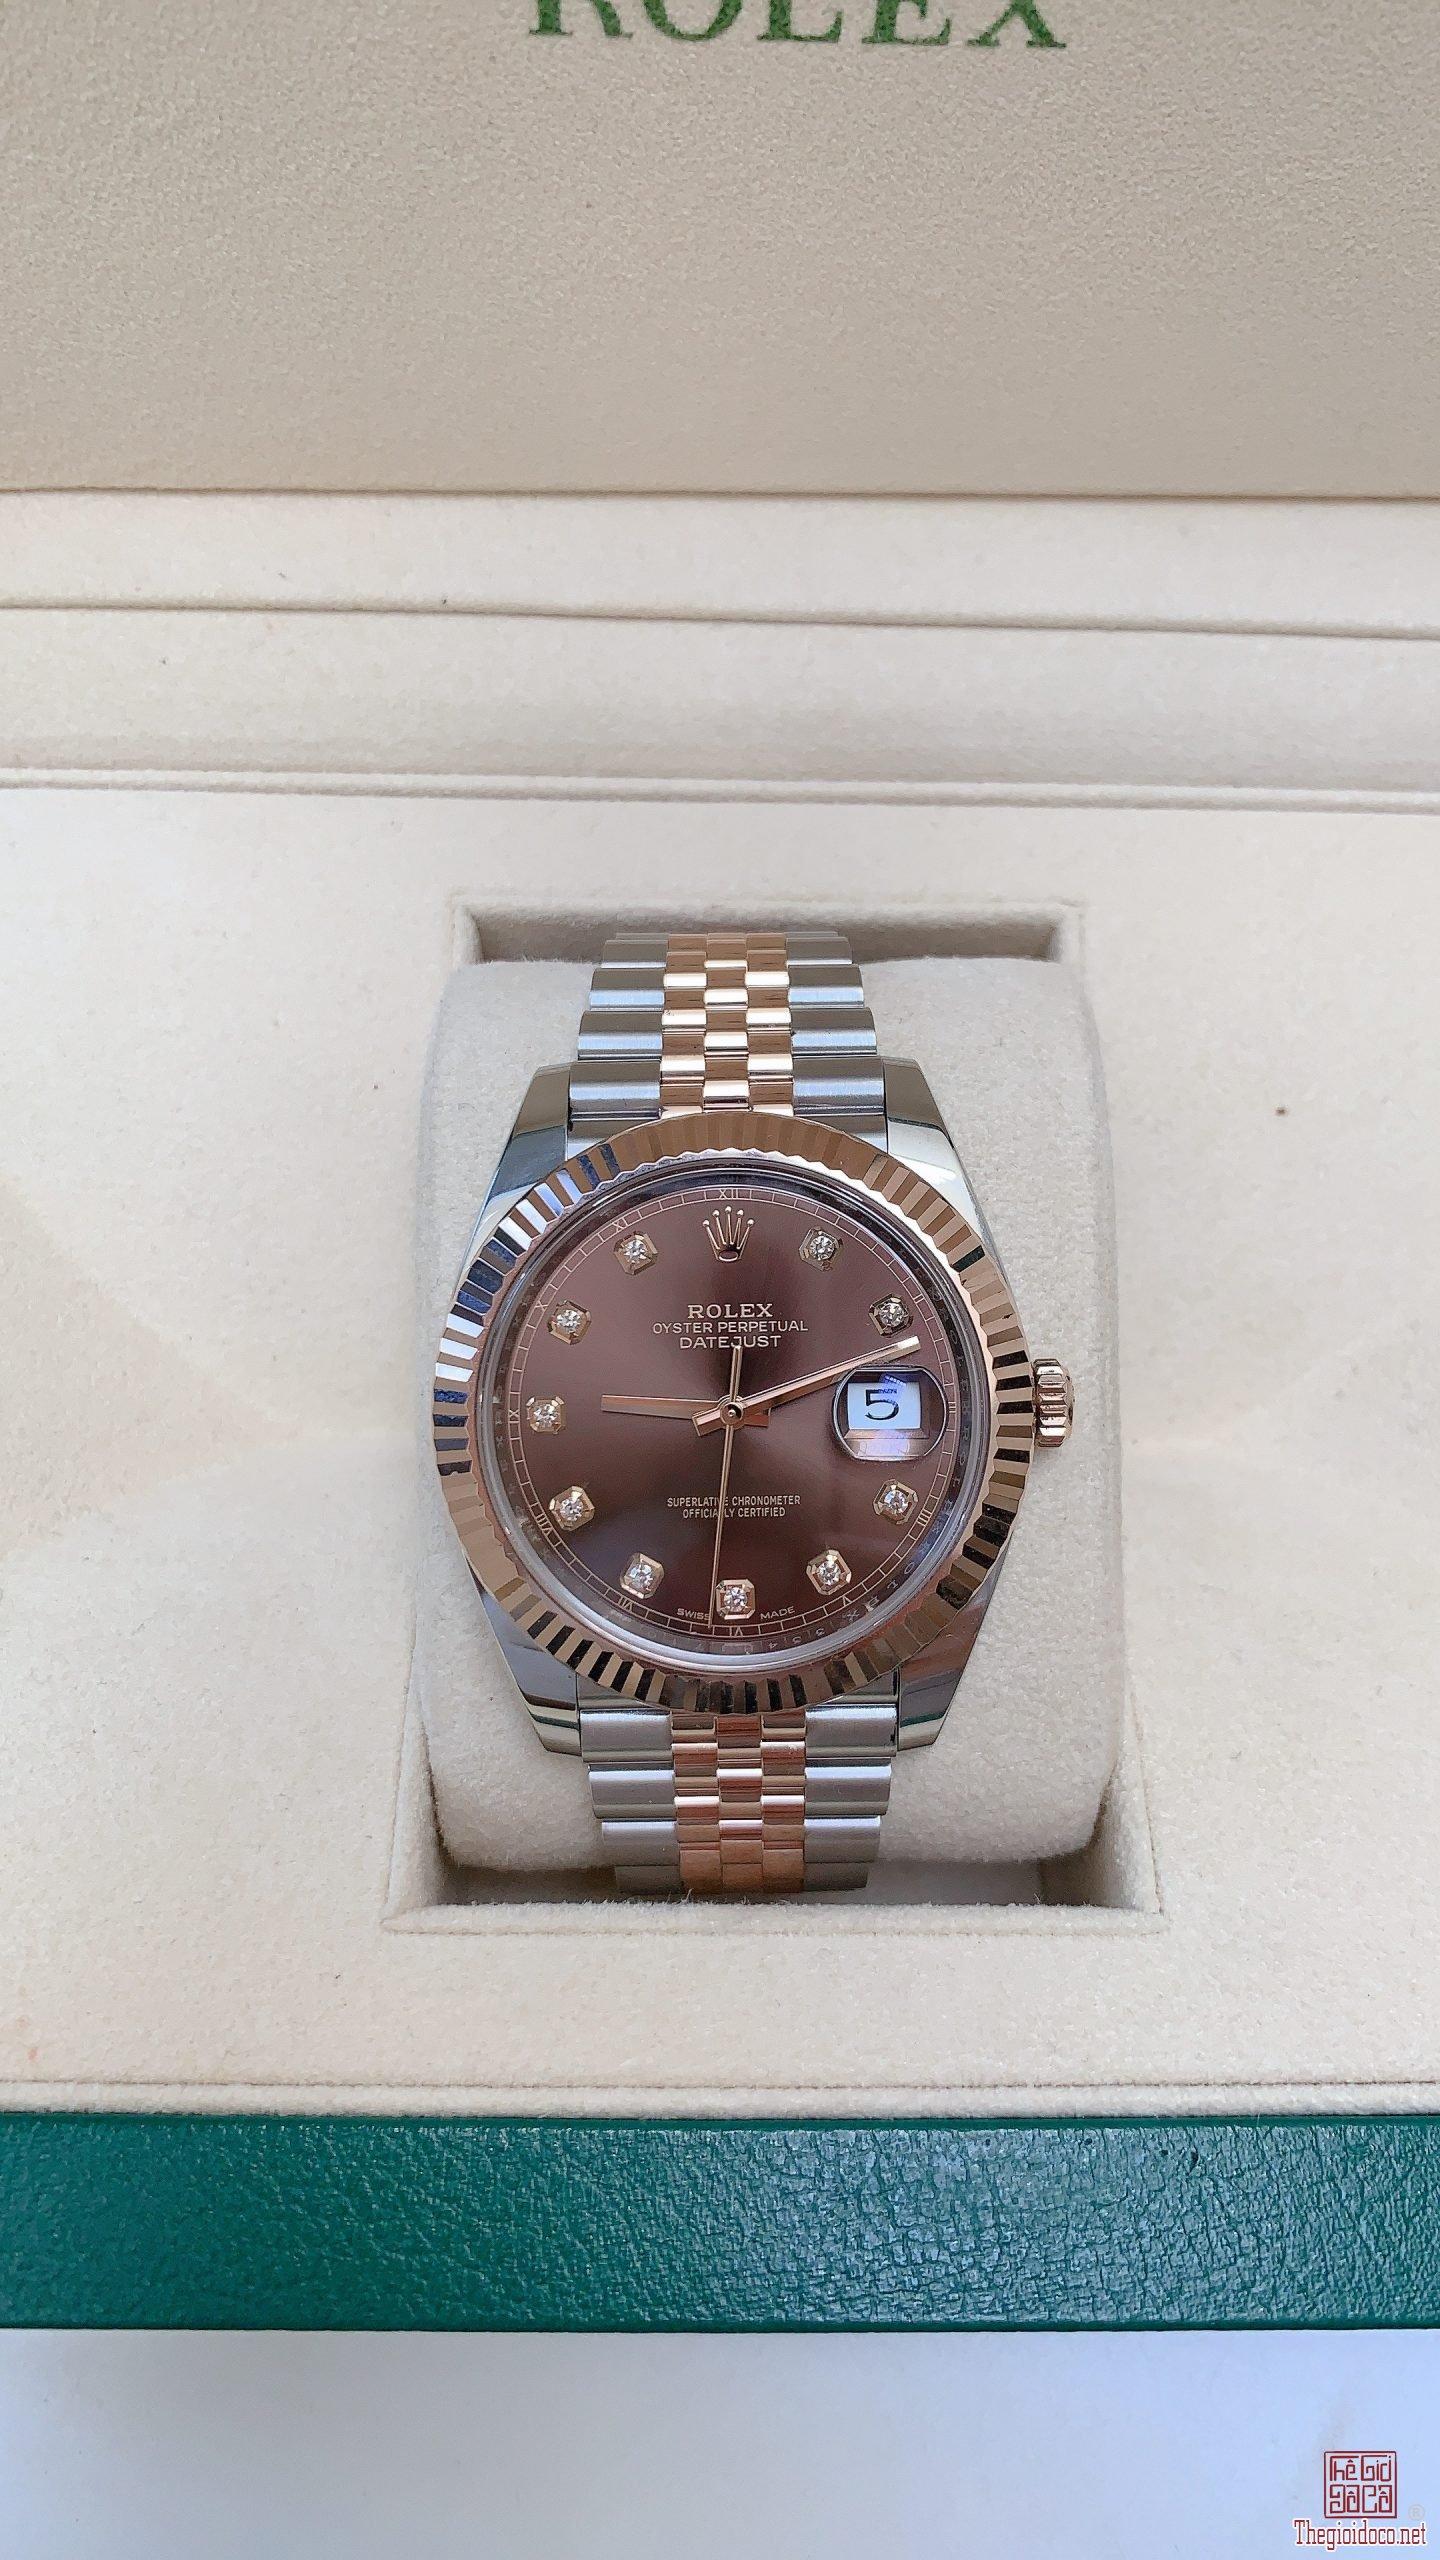 Đồng hồ Rolex Date Just 126331 mặt nâu chocolate